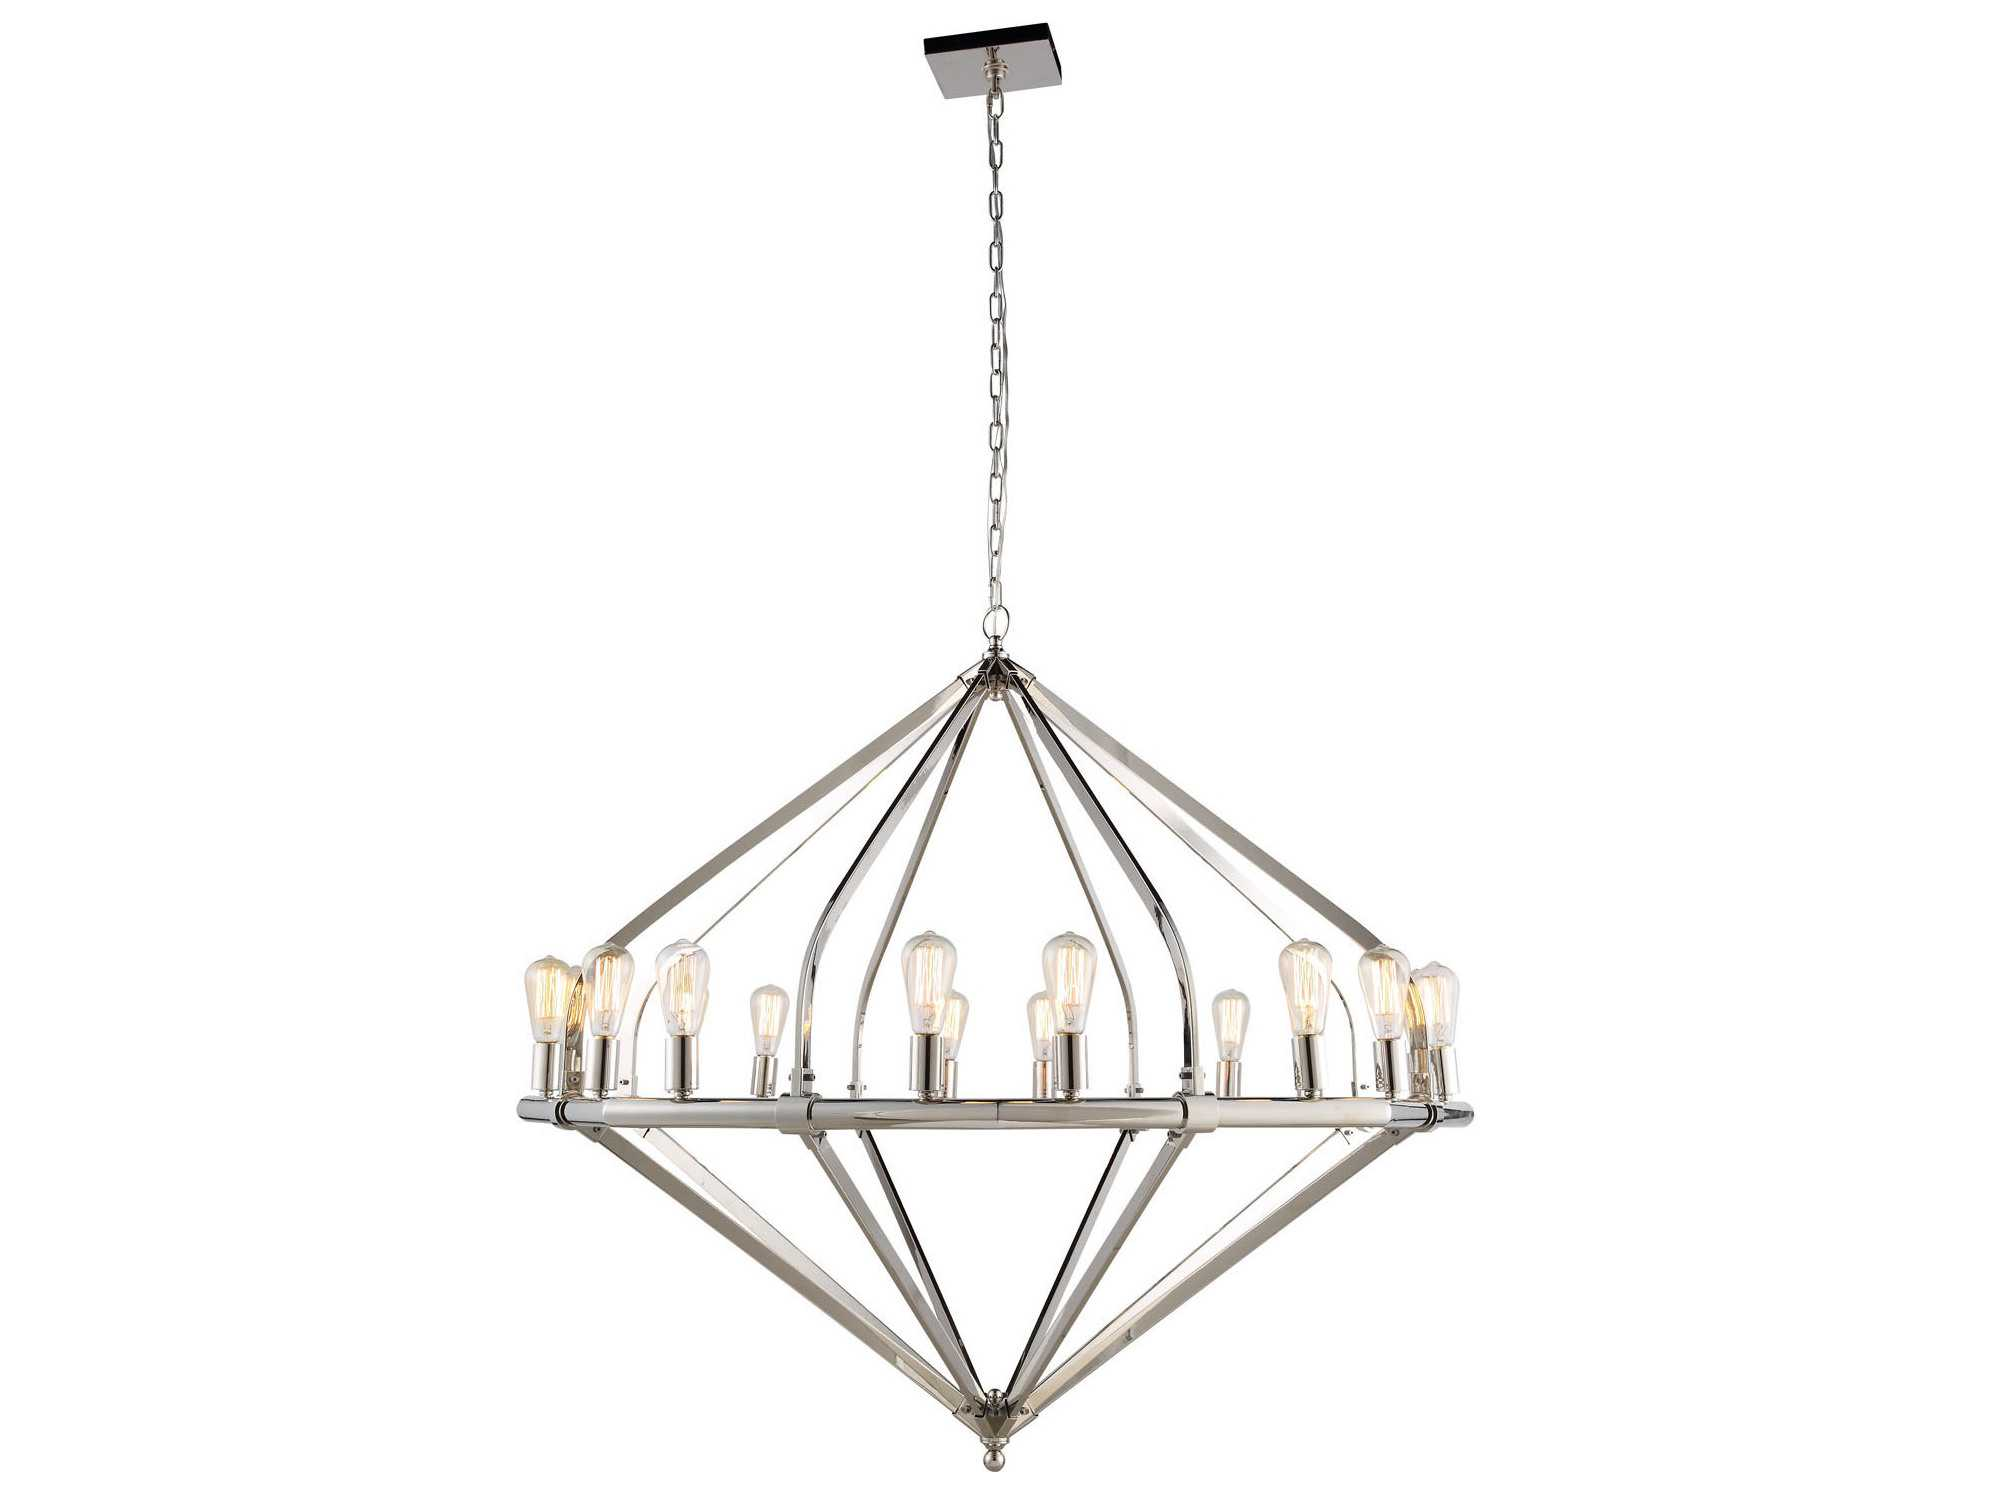 Elegant Lighting Illumina Polished Nickel 16 Lights 52